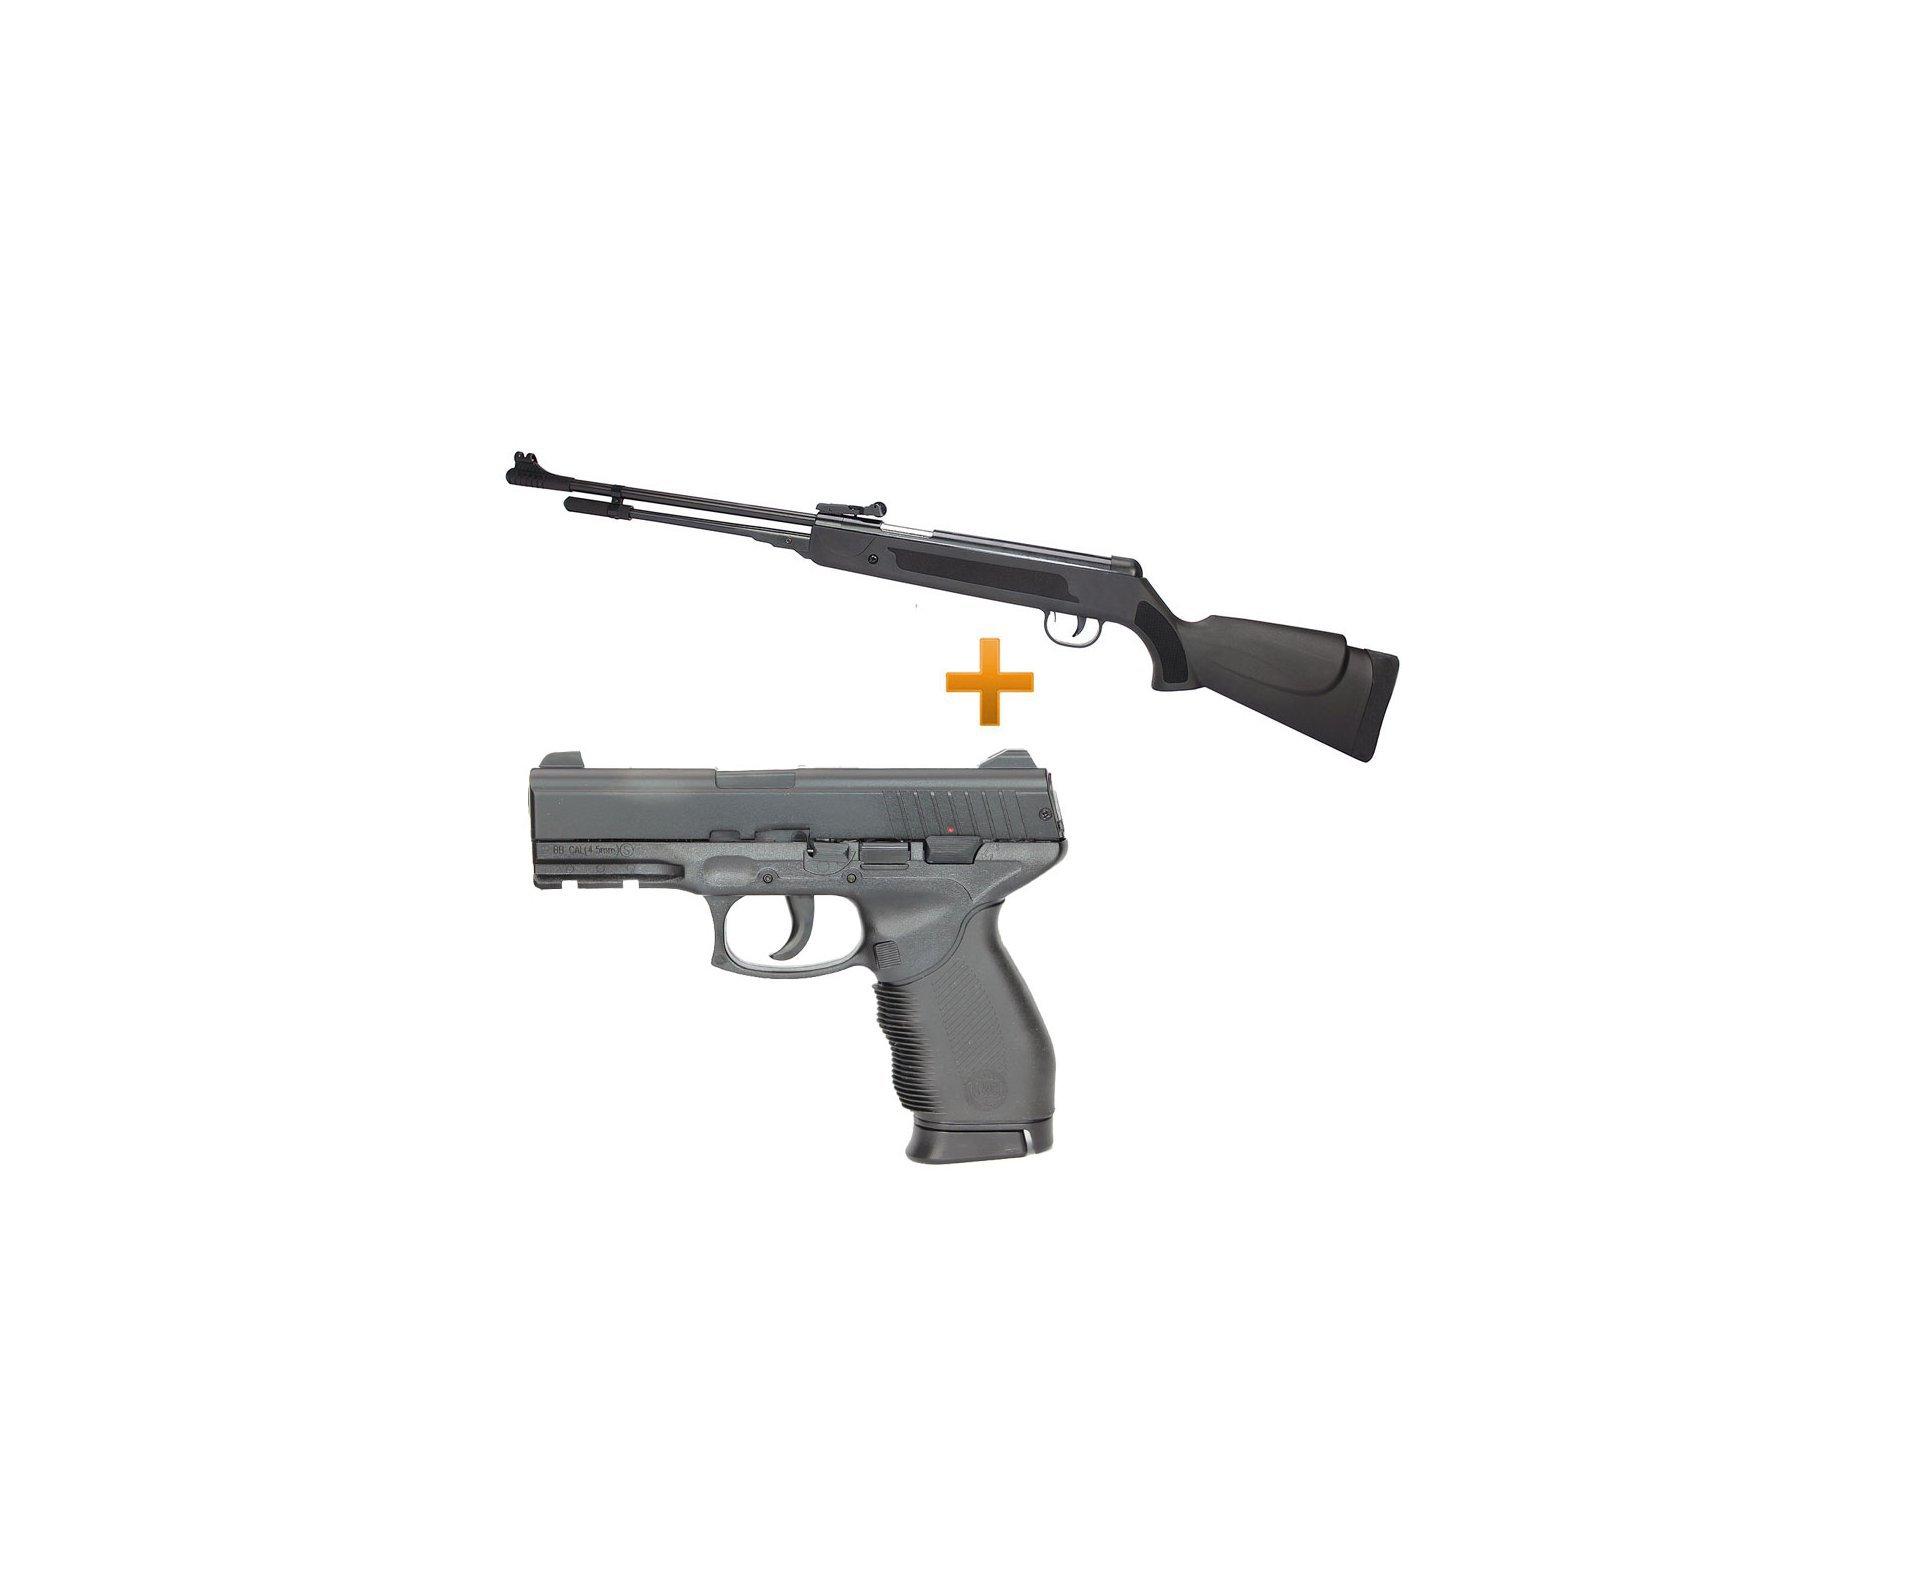 Carabina De Pressão Spring Black Cal 5,5mm + Pistola De Pressão 24/7 Mola - Slide Metal Cal 4,5mm - Kwc